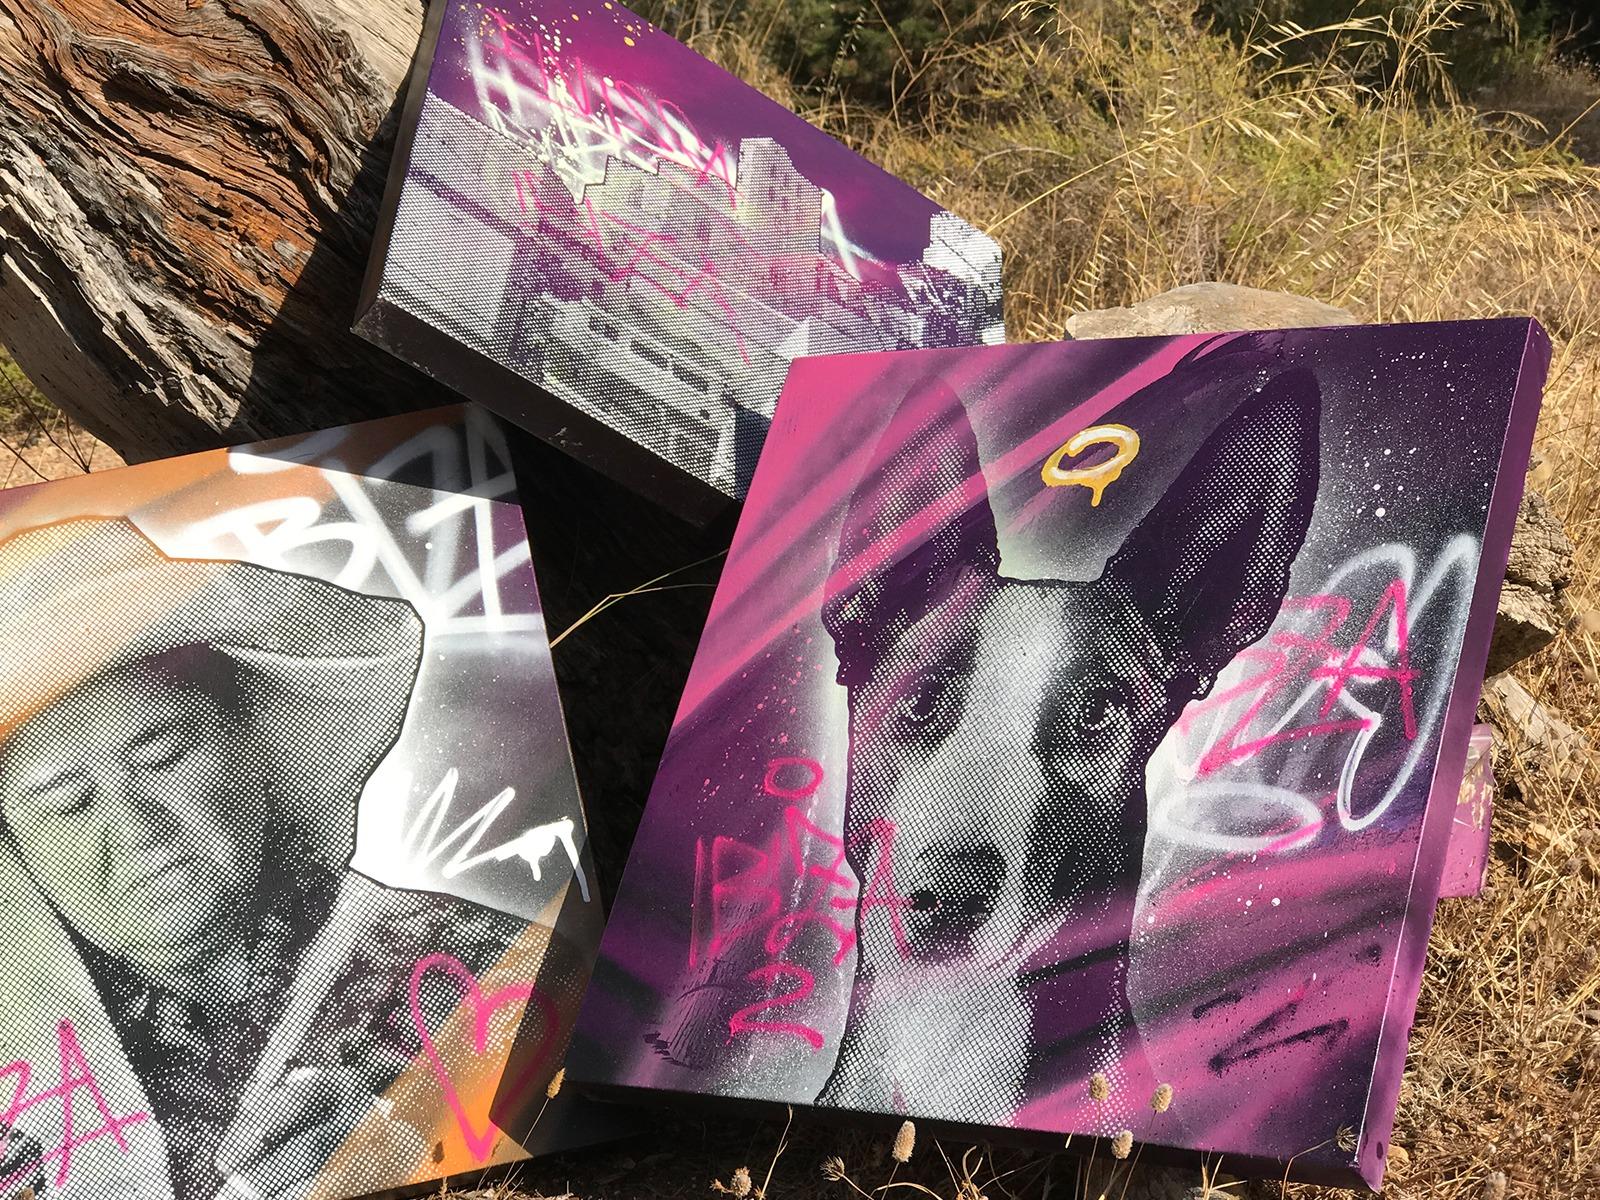 graffitiauftrag-graffitikuenstler-artmos4-graffiti-artist-ibiza-bfree-canvas-podenko